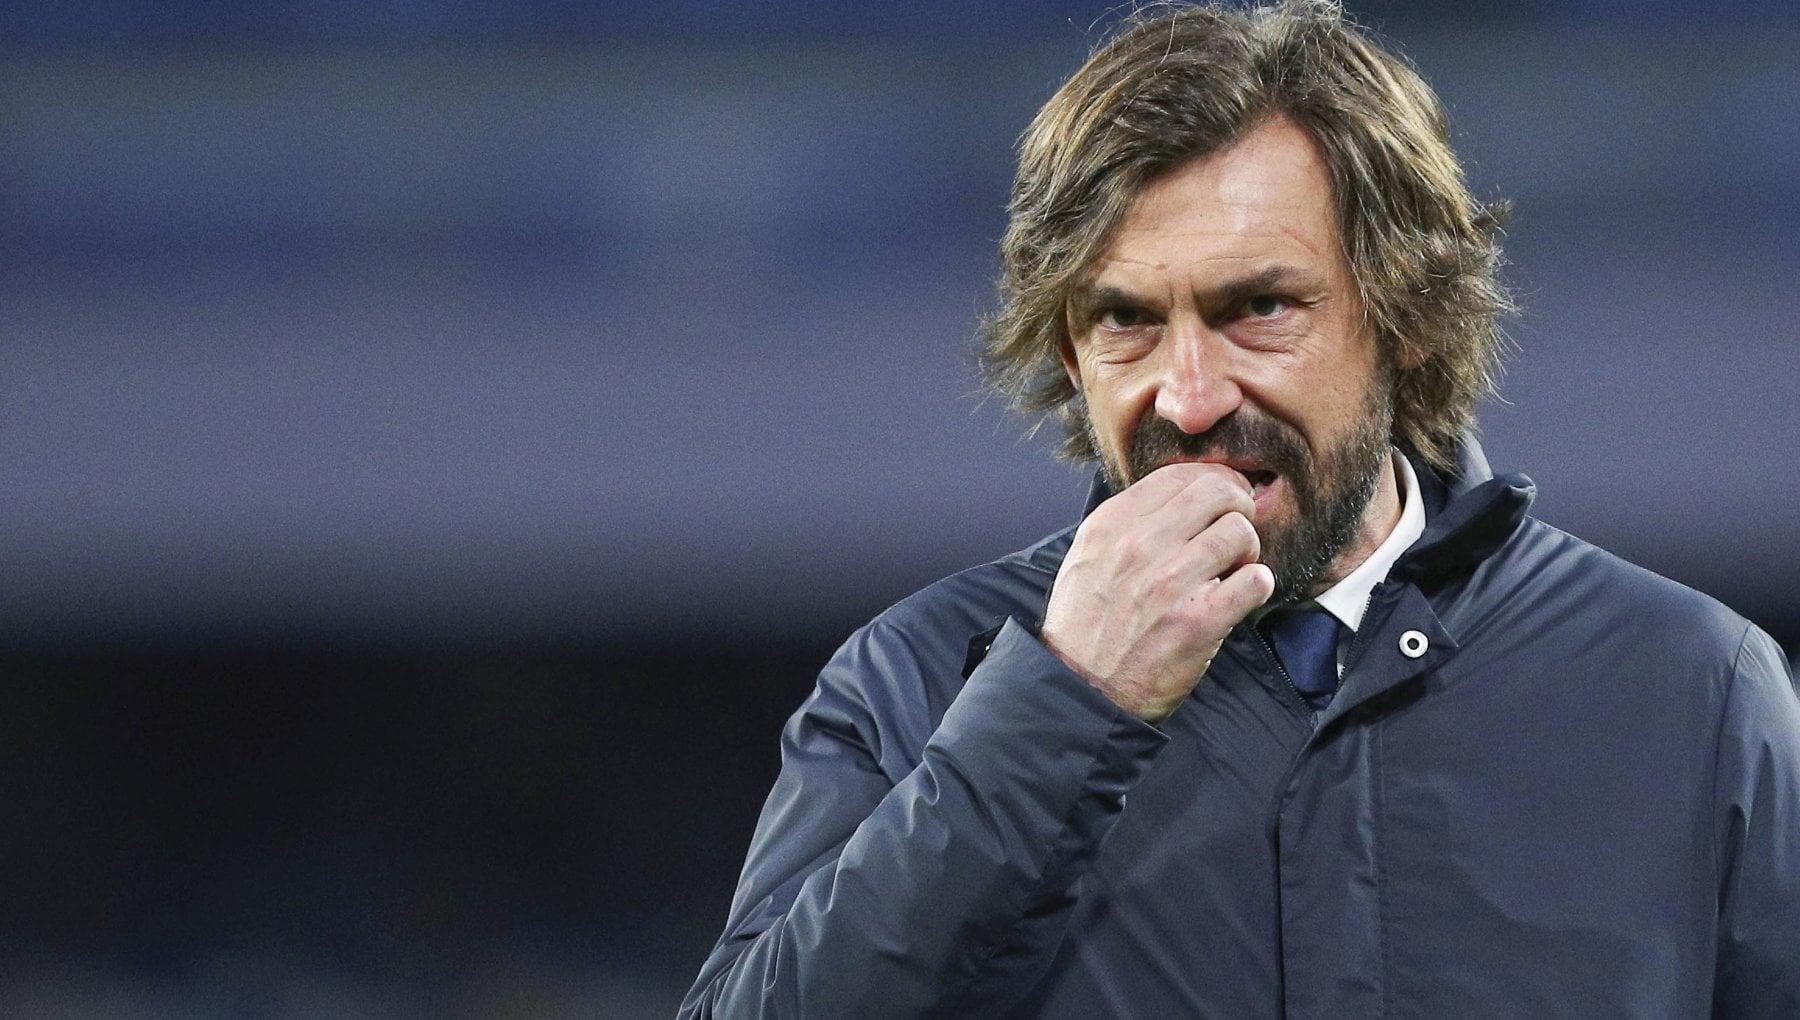 Juventus, 44 milioni irrinunciabili: ora la missione si chiama Champions